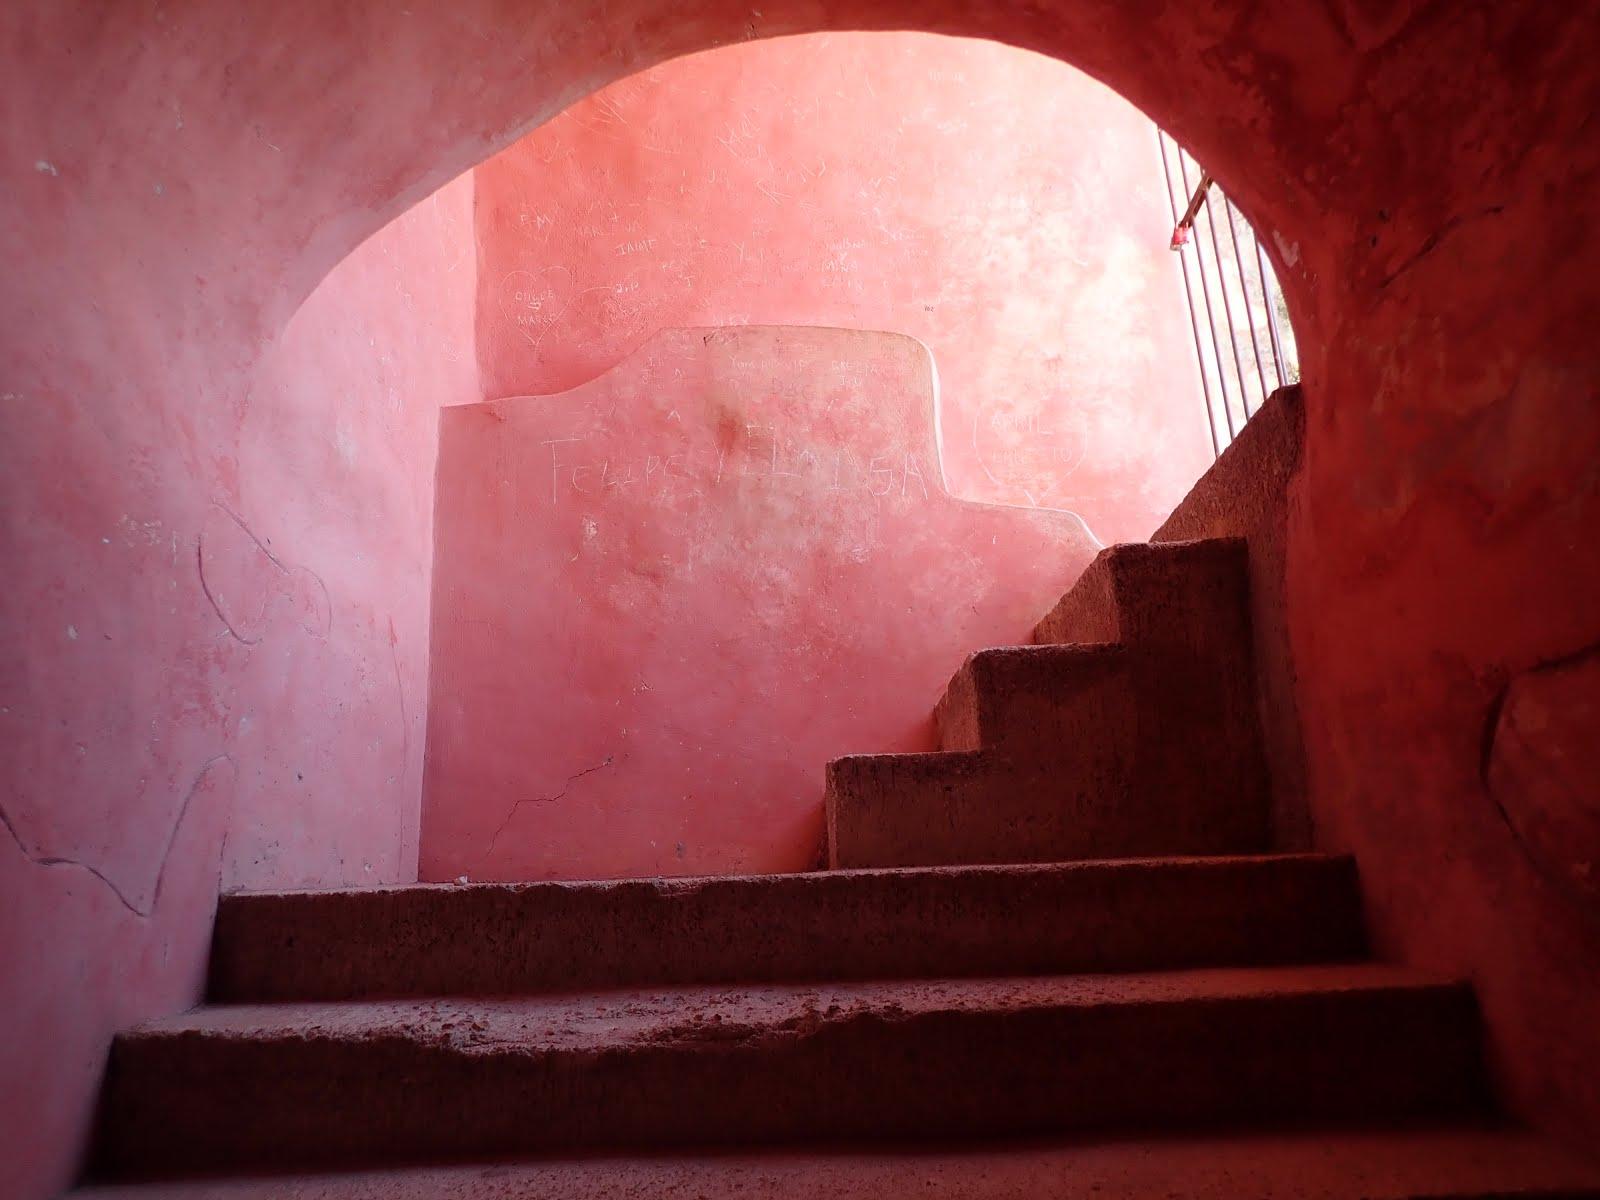 les escaliers roses de l'ancien couvent de san bernardino